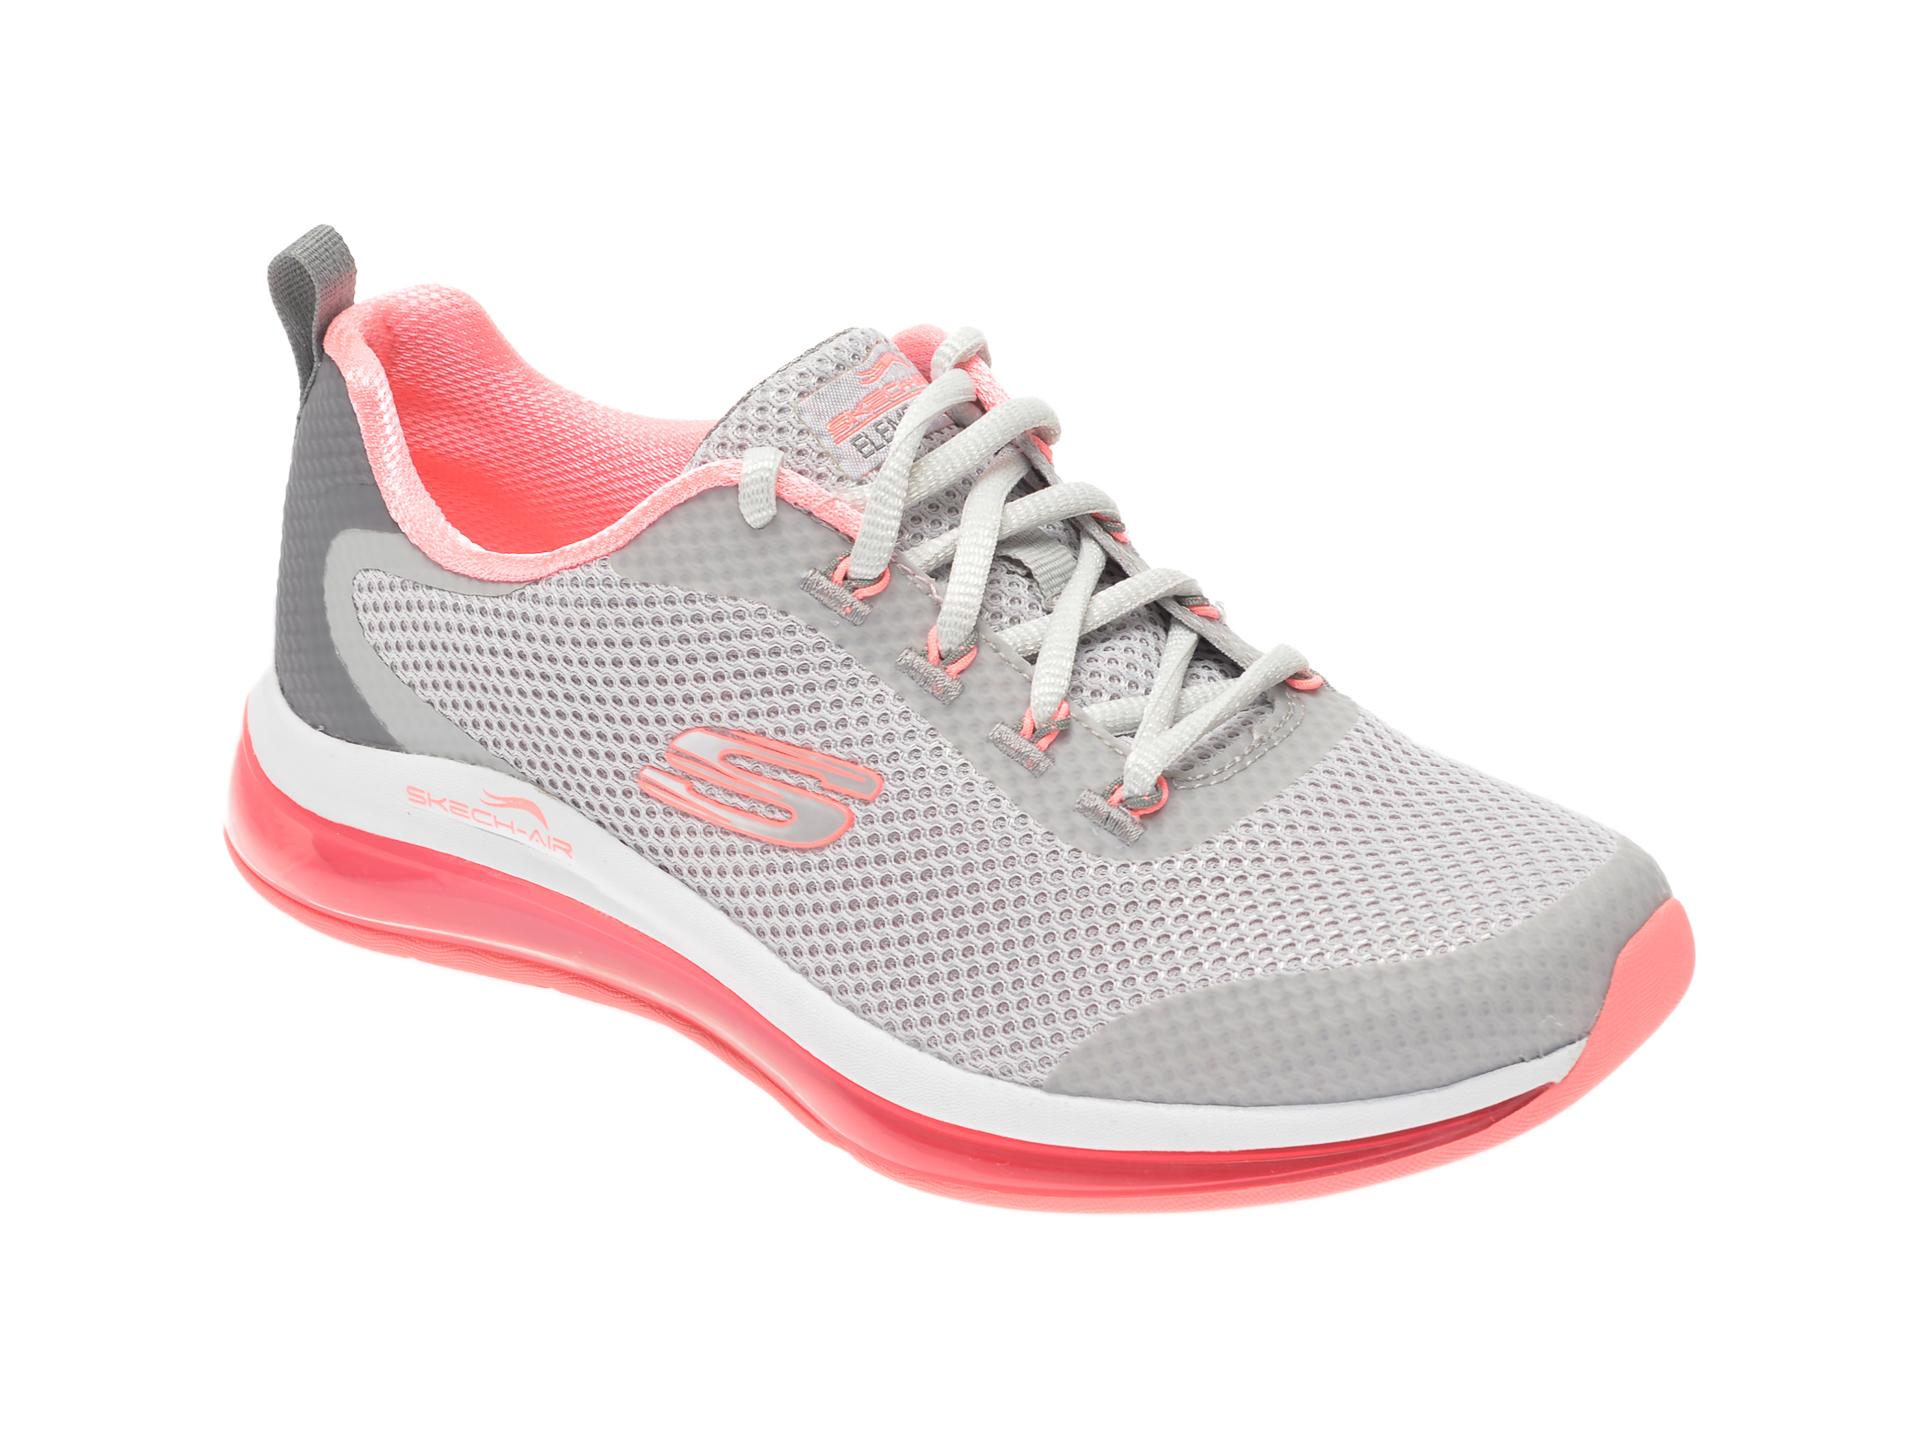 Pantofi sport SKECHERS gri, Skech-Air Element 2.0 Looking Fast, din material textil New